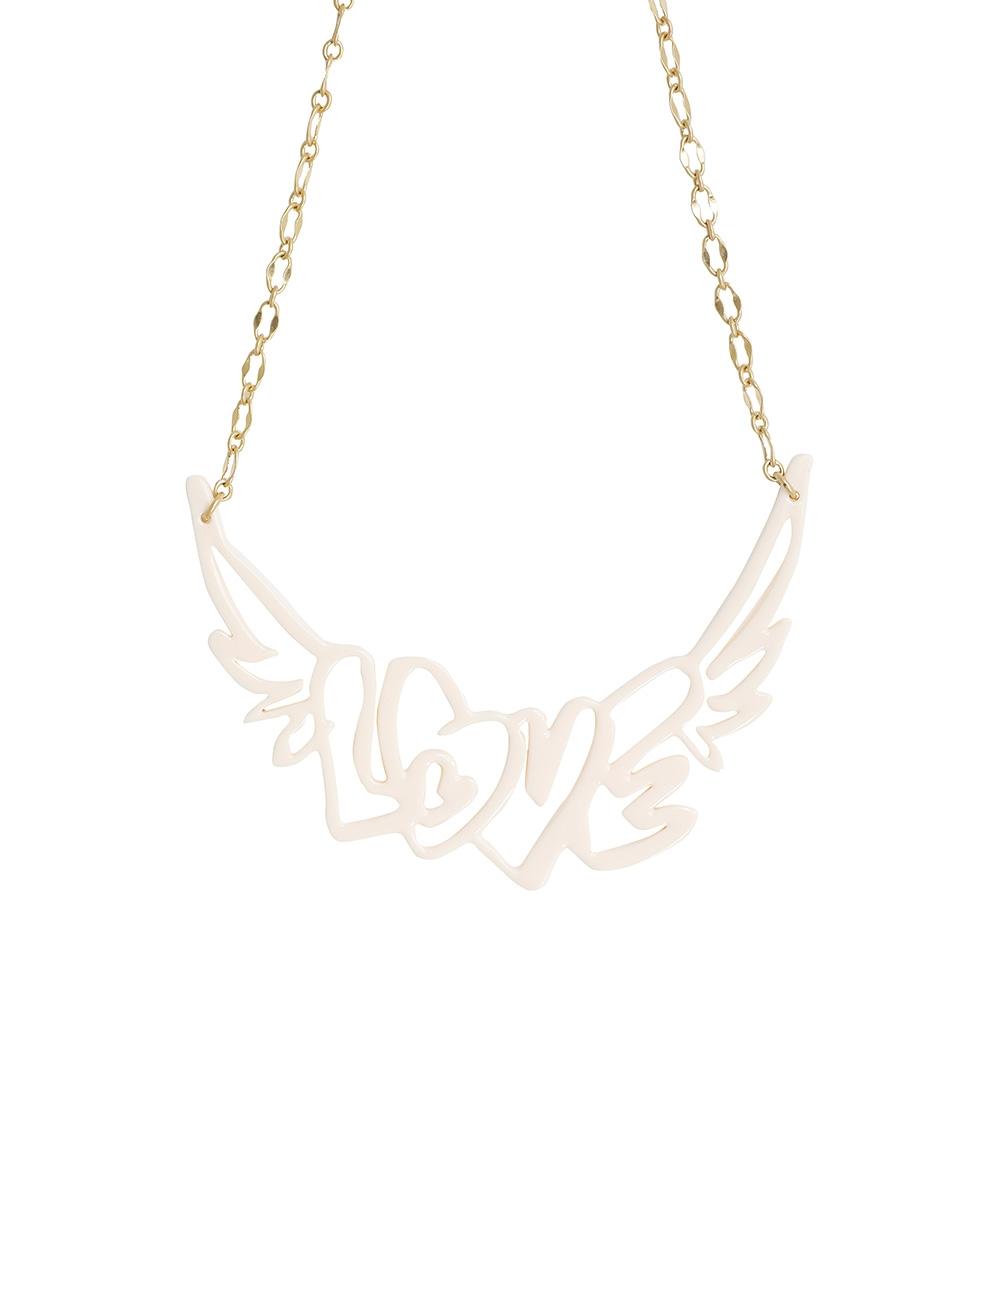 The Lovestruck Necklace